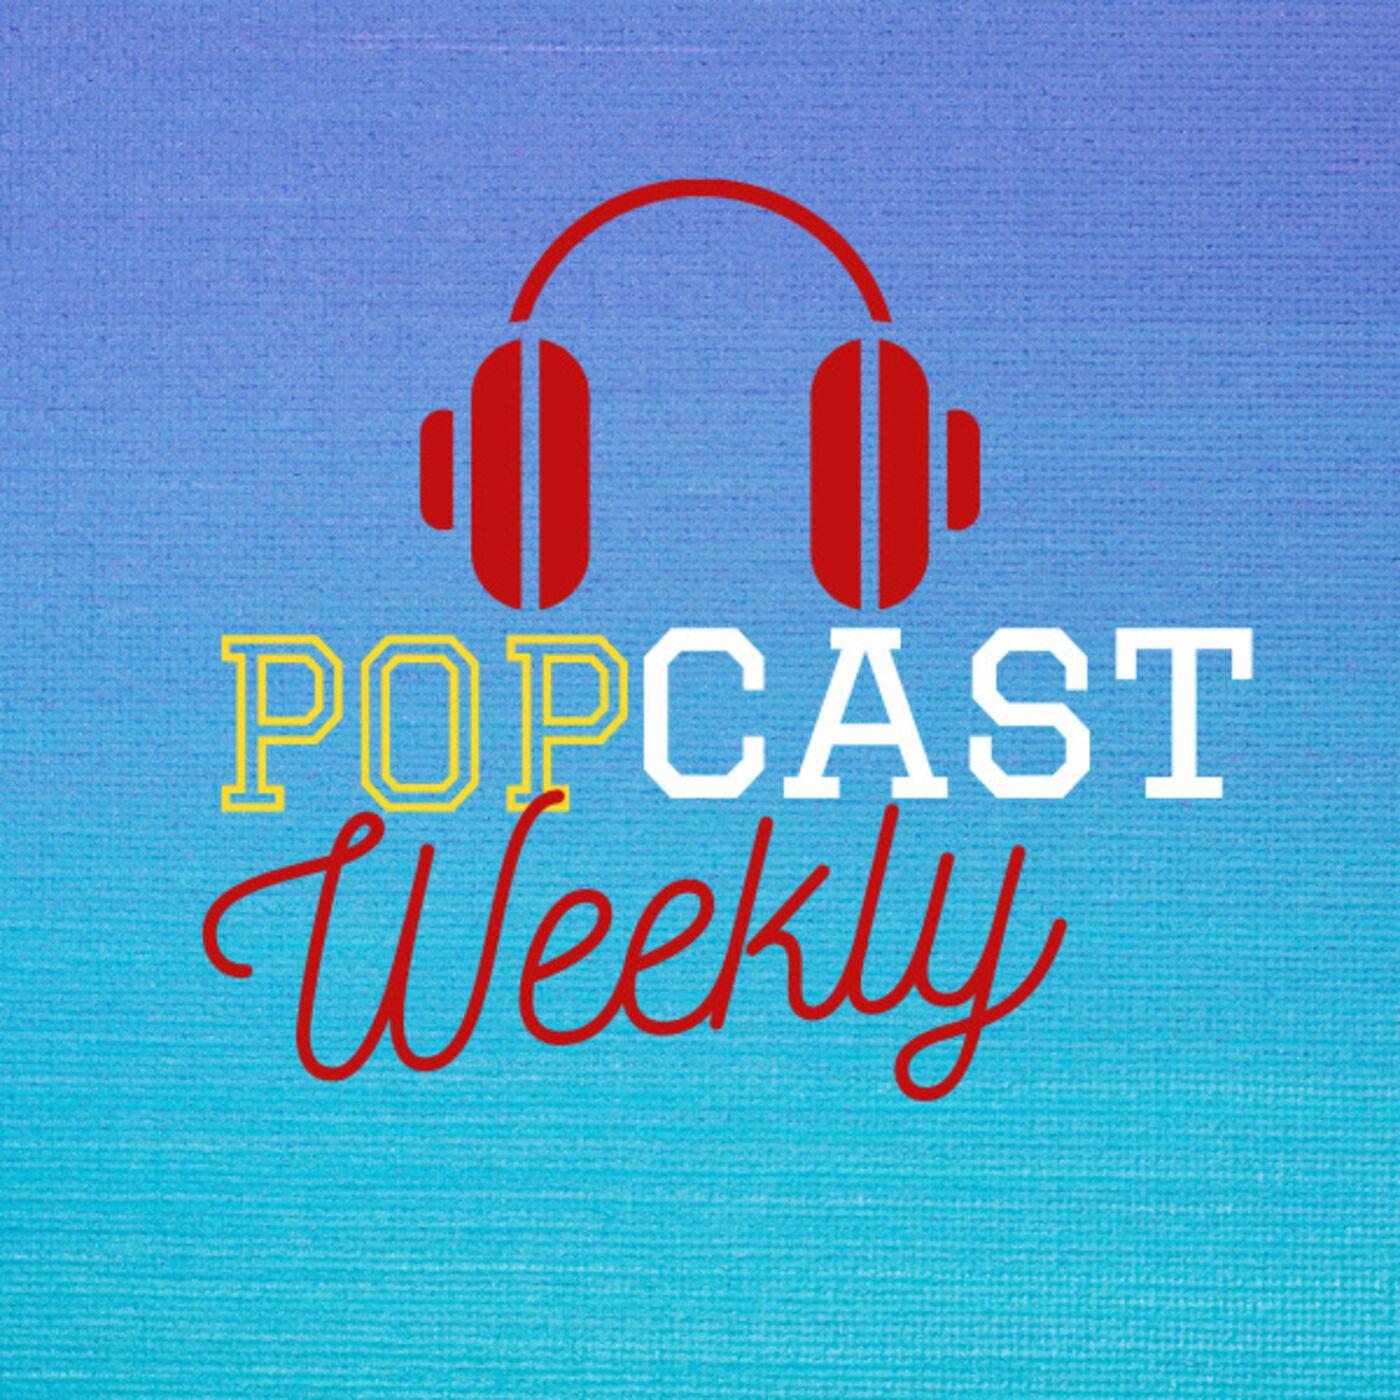 PopCast Weekly